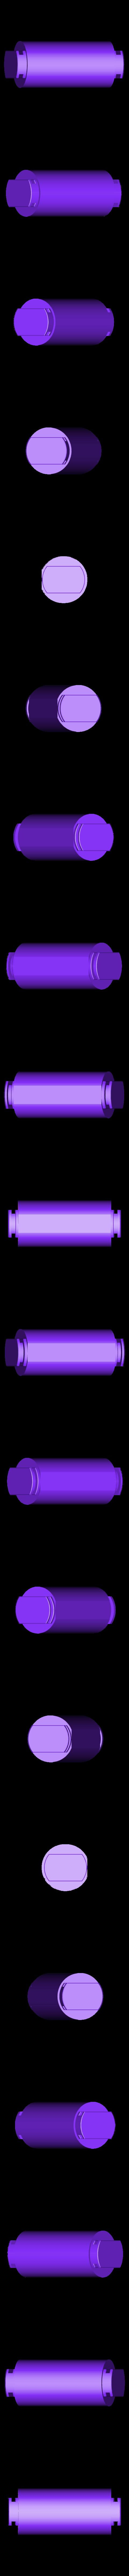 Finder_Spool_Drum_-_50mm.stl Download free STL file Overhead Spool Holder - Flashforge Finder • 3D print object, itech3dp